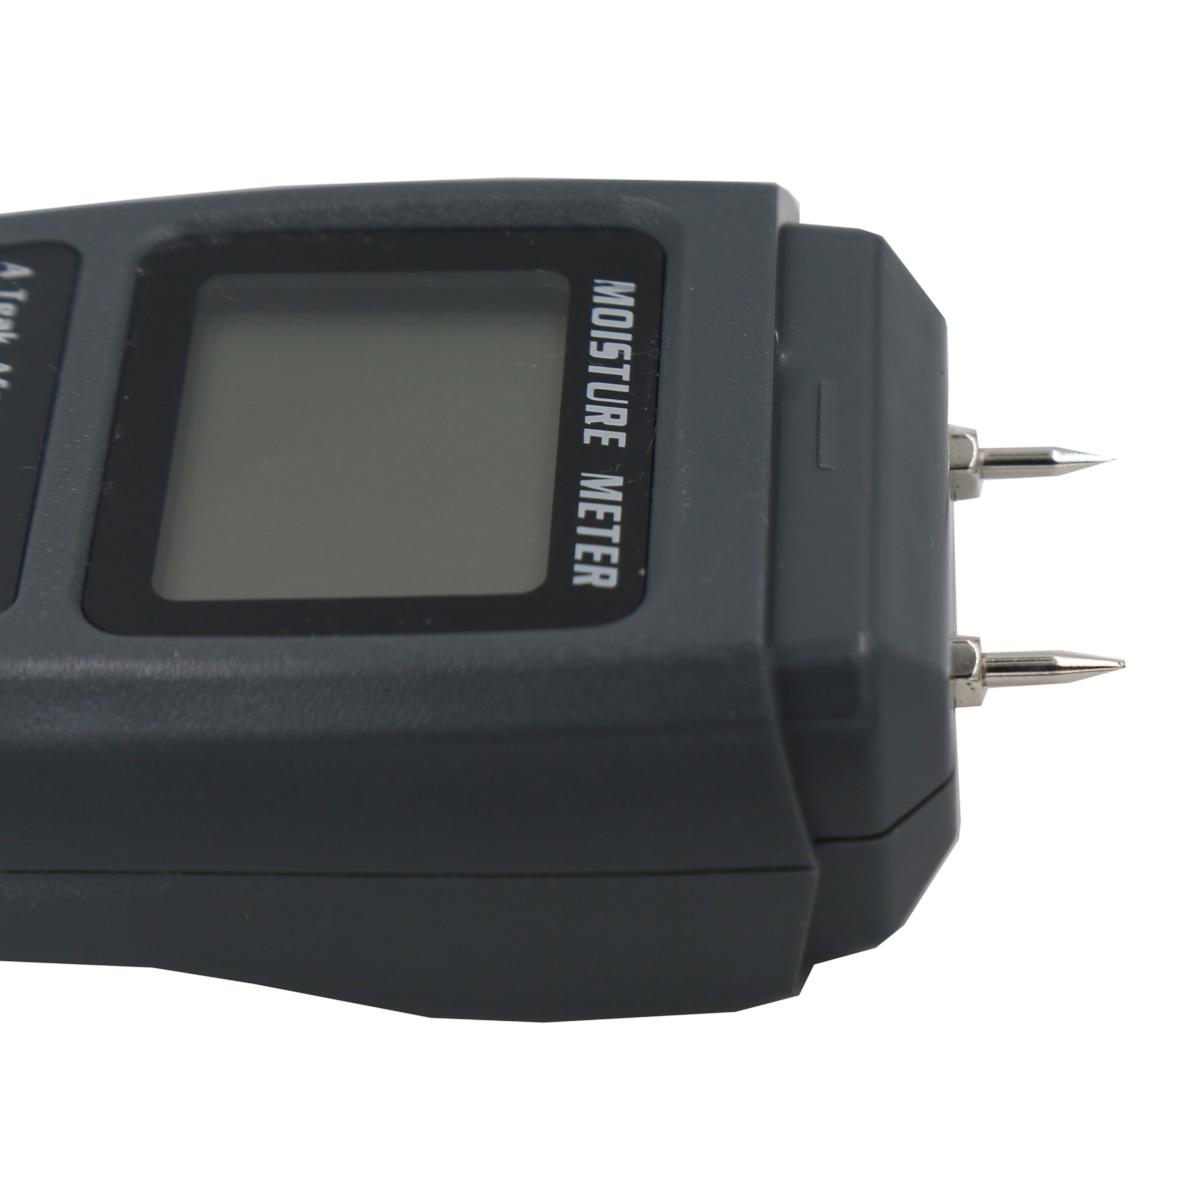 shentaotao 0-99.9/% Dos Clavijas De Madera Digital Medidor De Humedad De Madera Probador De La Humedad De La Madera Higr/ómetro H/úmedo Detector Pantalla LCD Grande